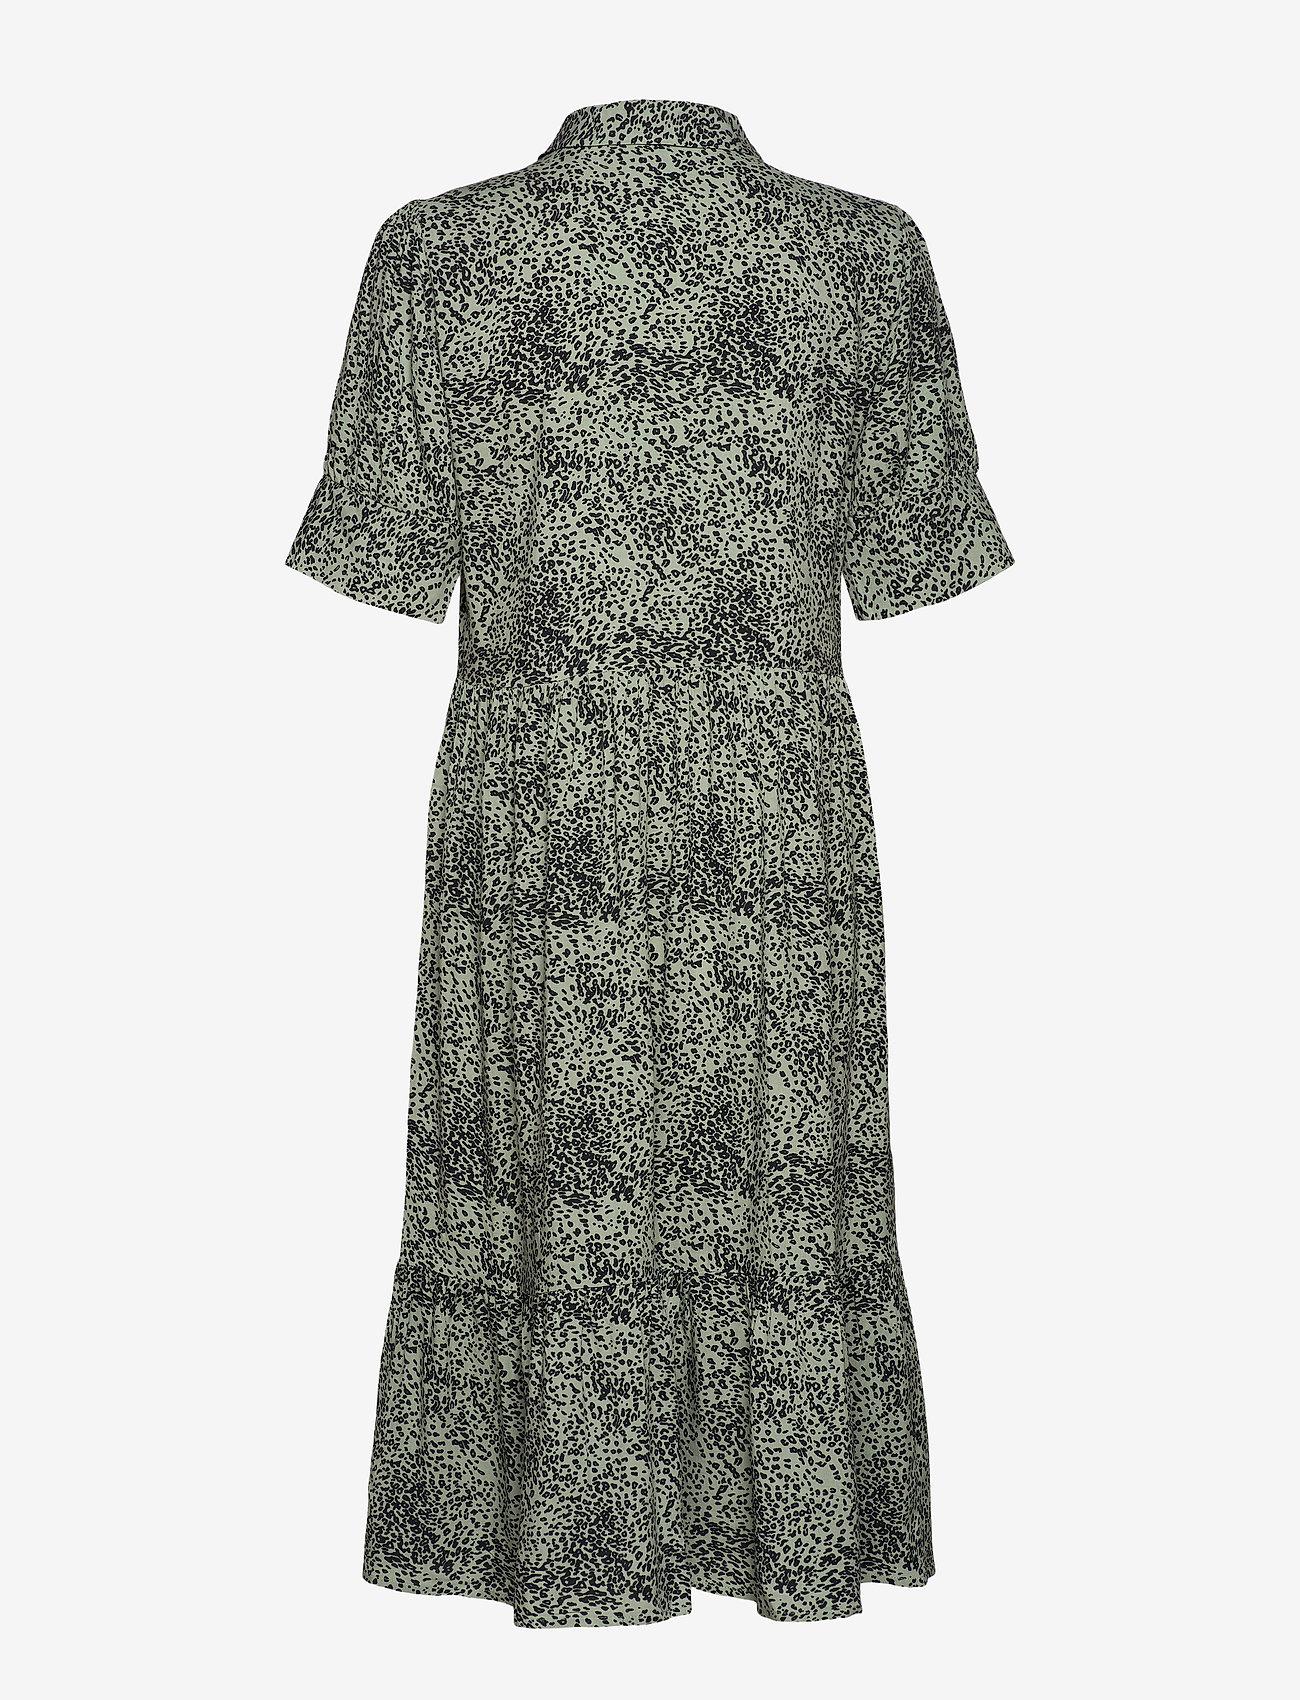 Soyaconcept - SC-NIKA - everyday dresses - 7580c mineral green combi - 1